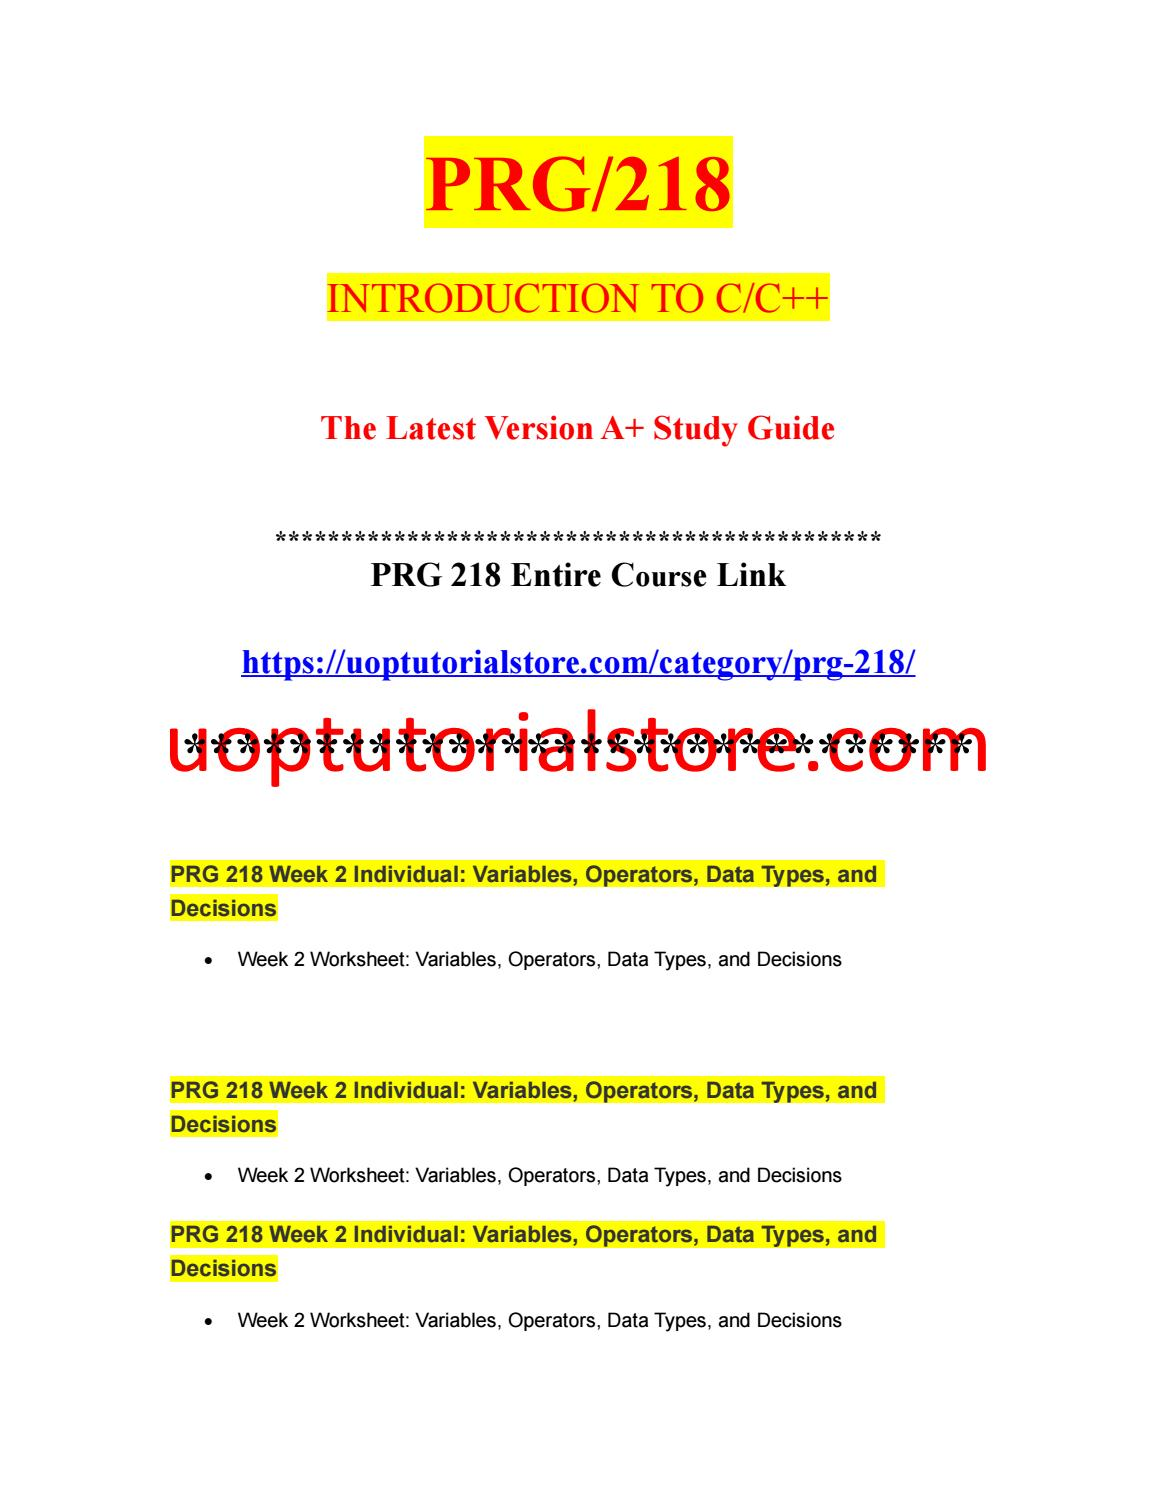 PRG 218 Week 2 Individual Variables, Operators, Data Types, and